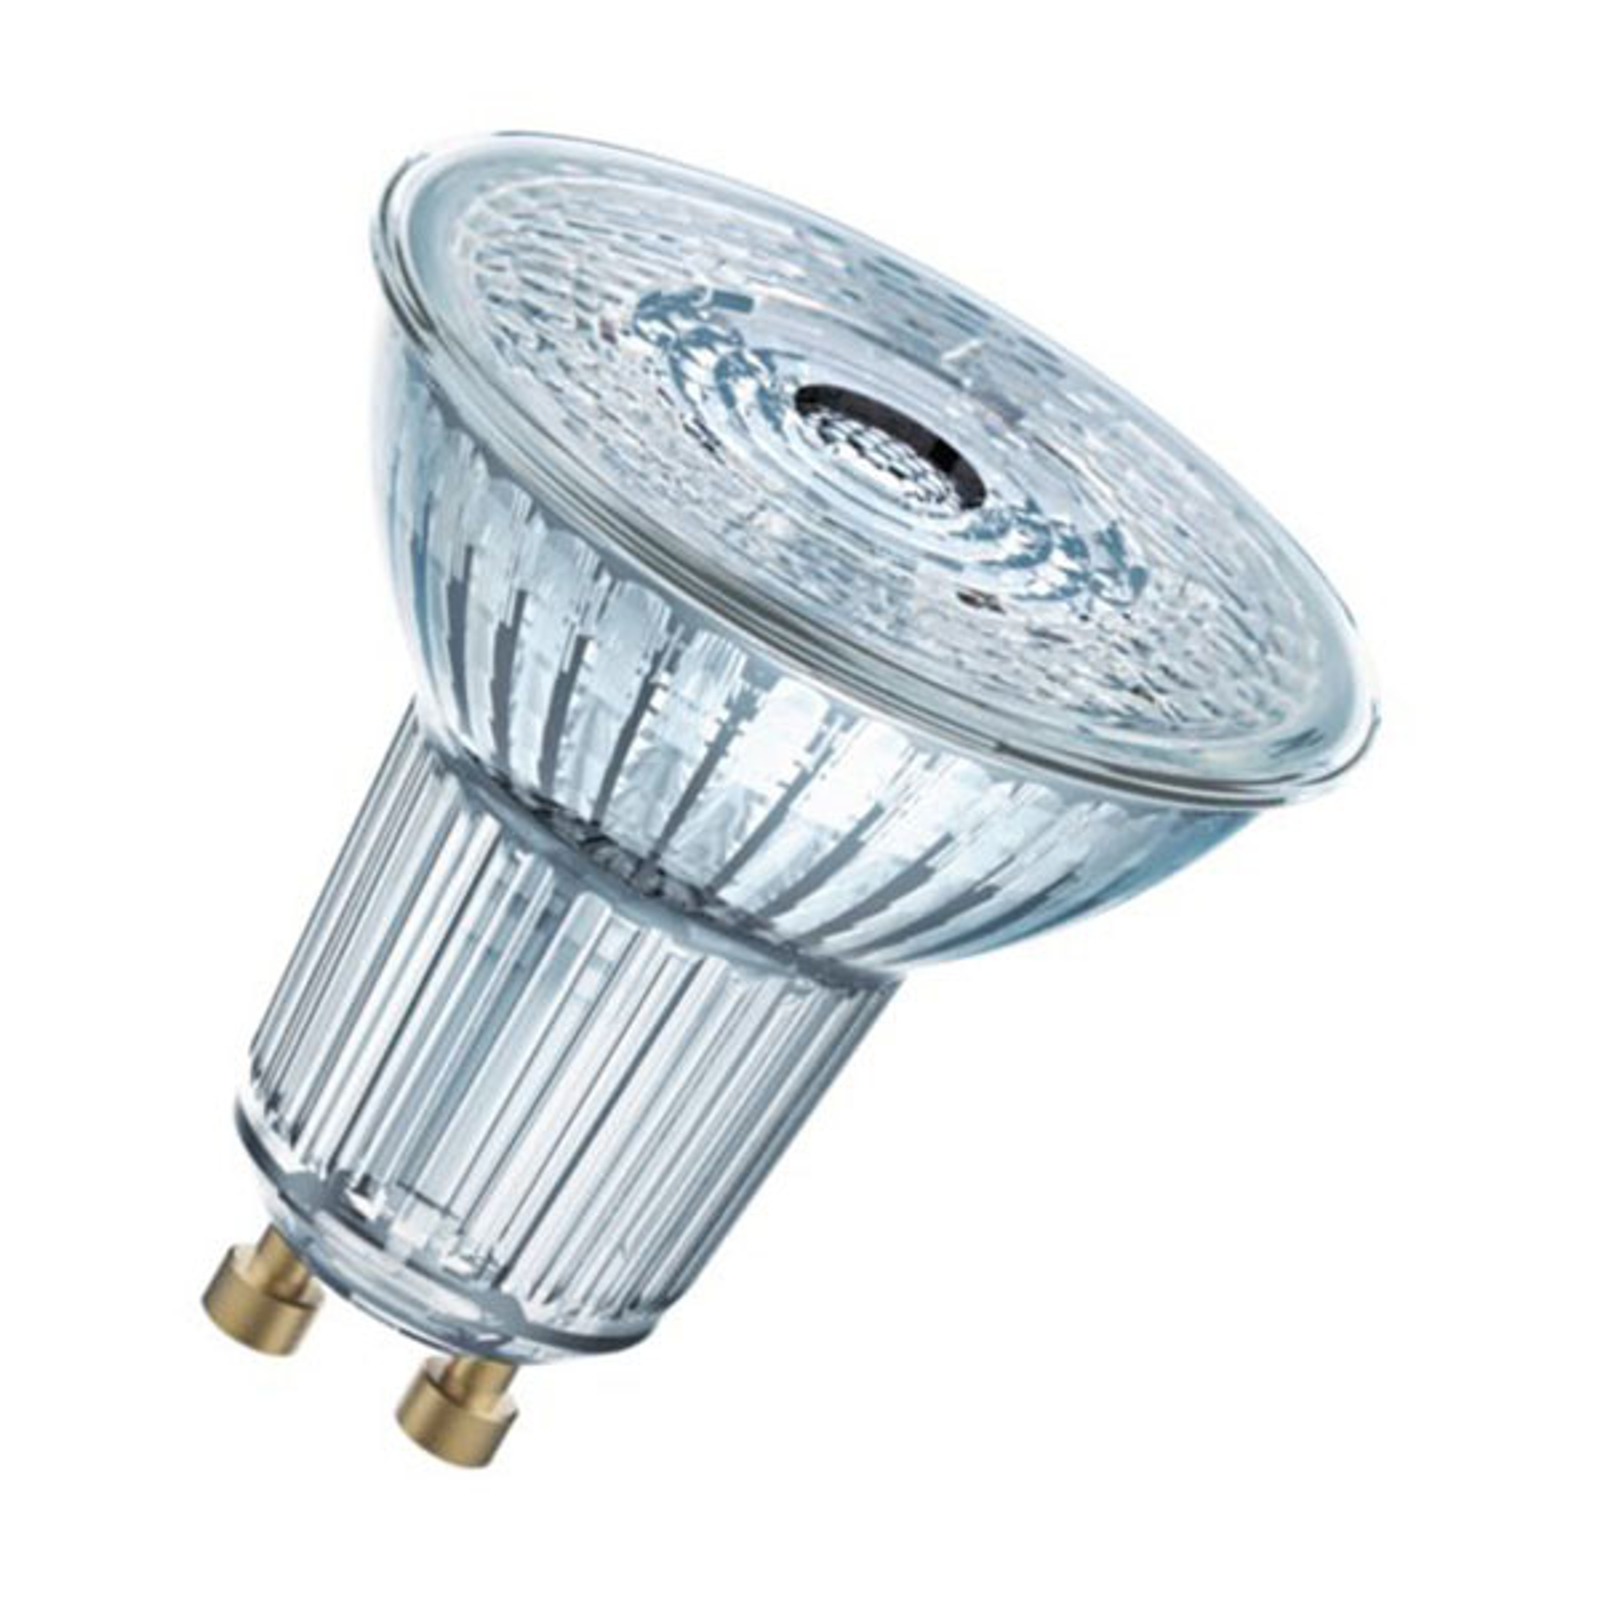 OSRAM LED-Reflektor GU10 4,3W PAR16 840 36° 2er